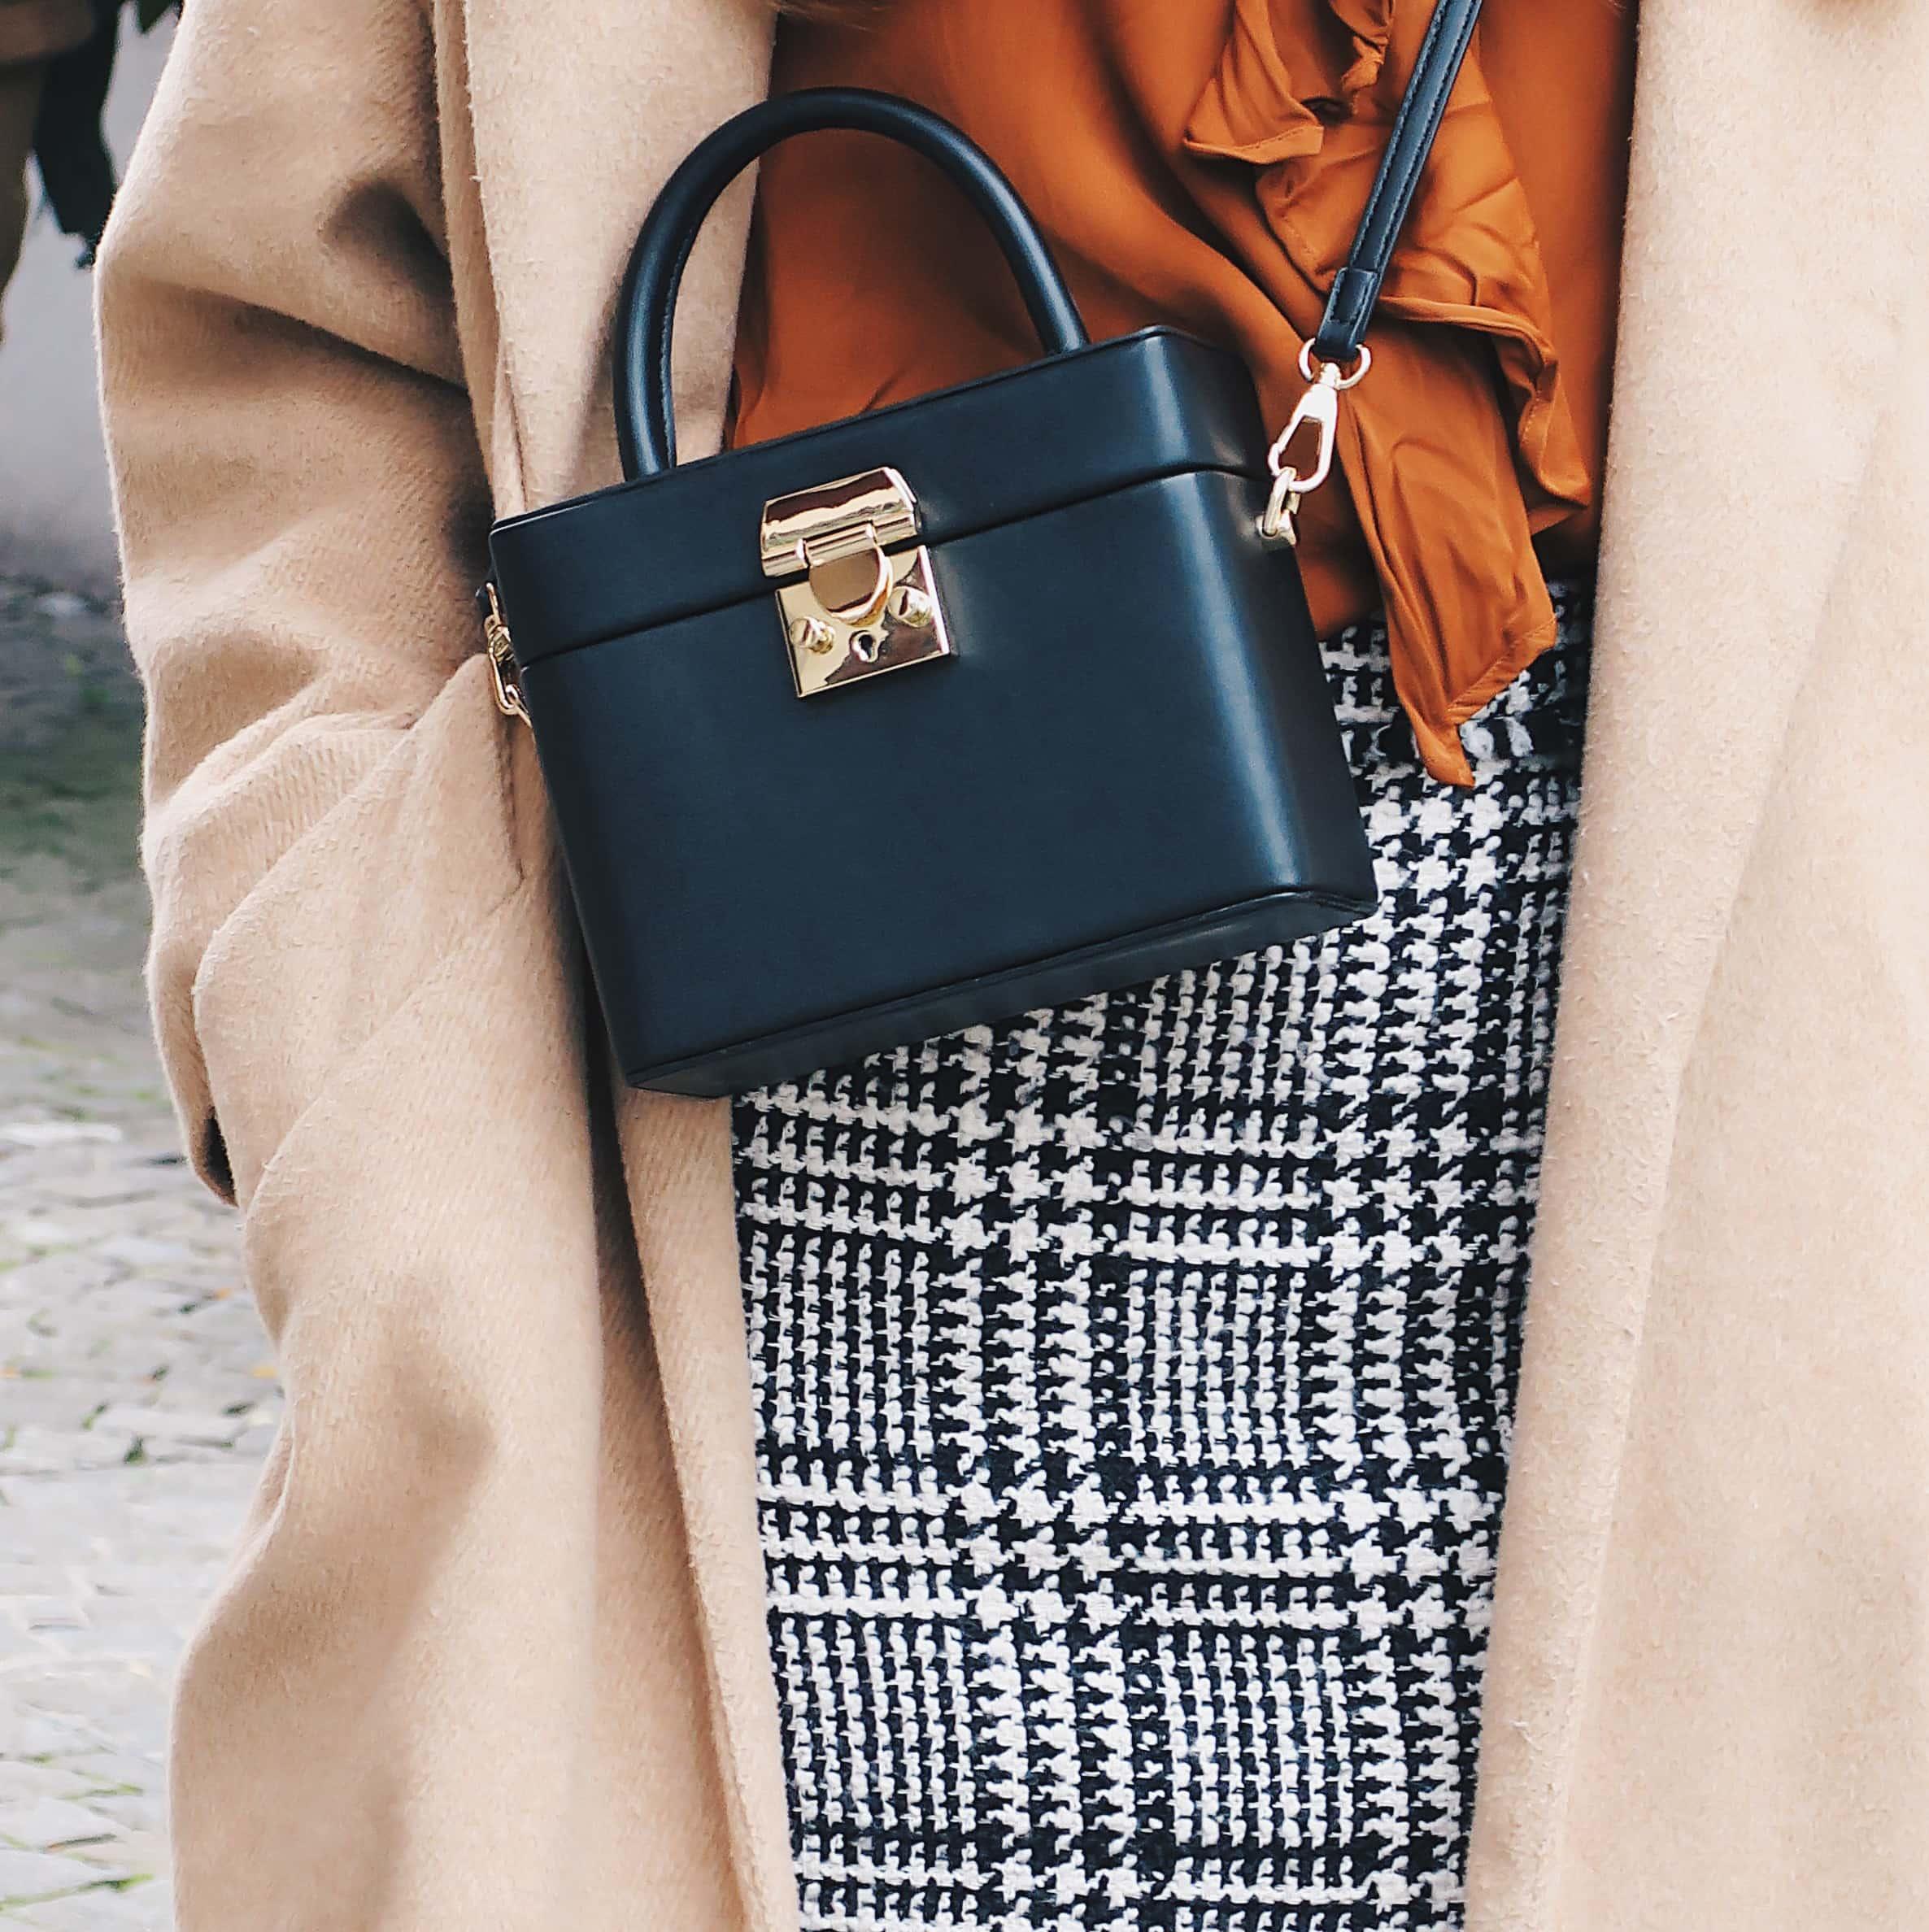 Schweizer Mode Blog